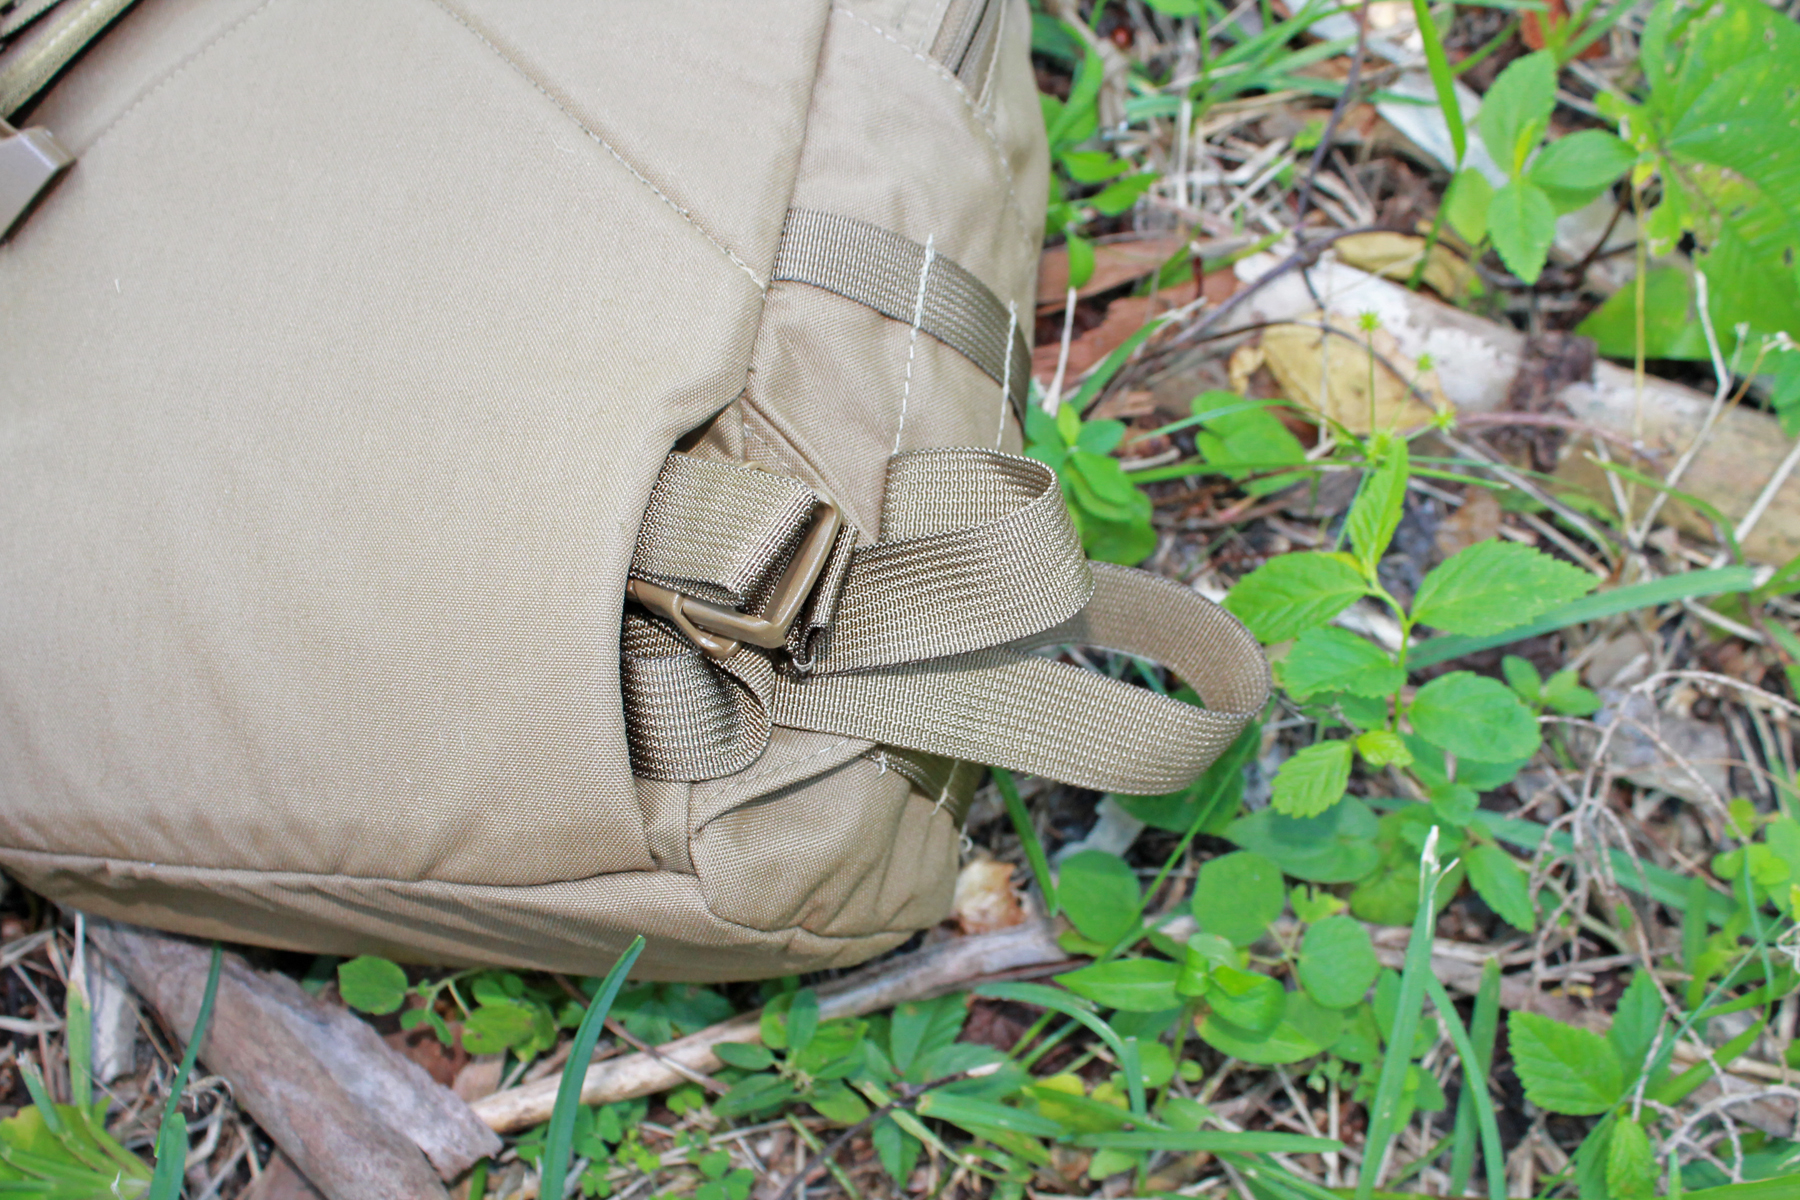 MSM Adapt Pack lower straps